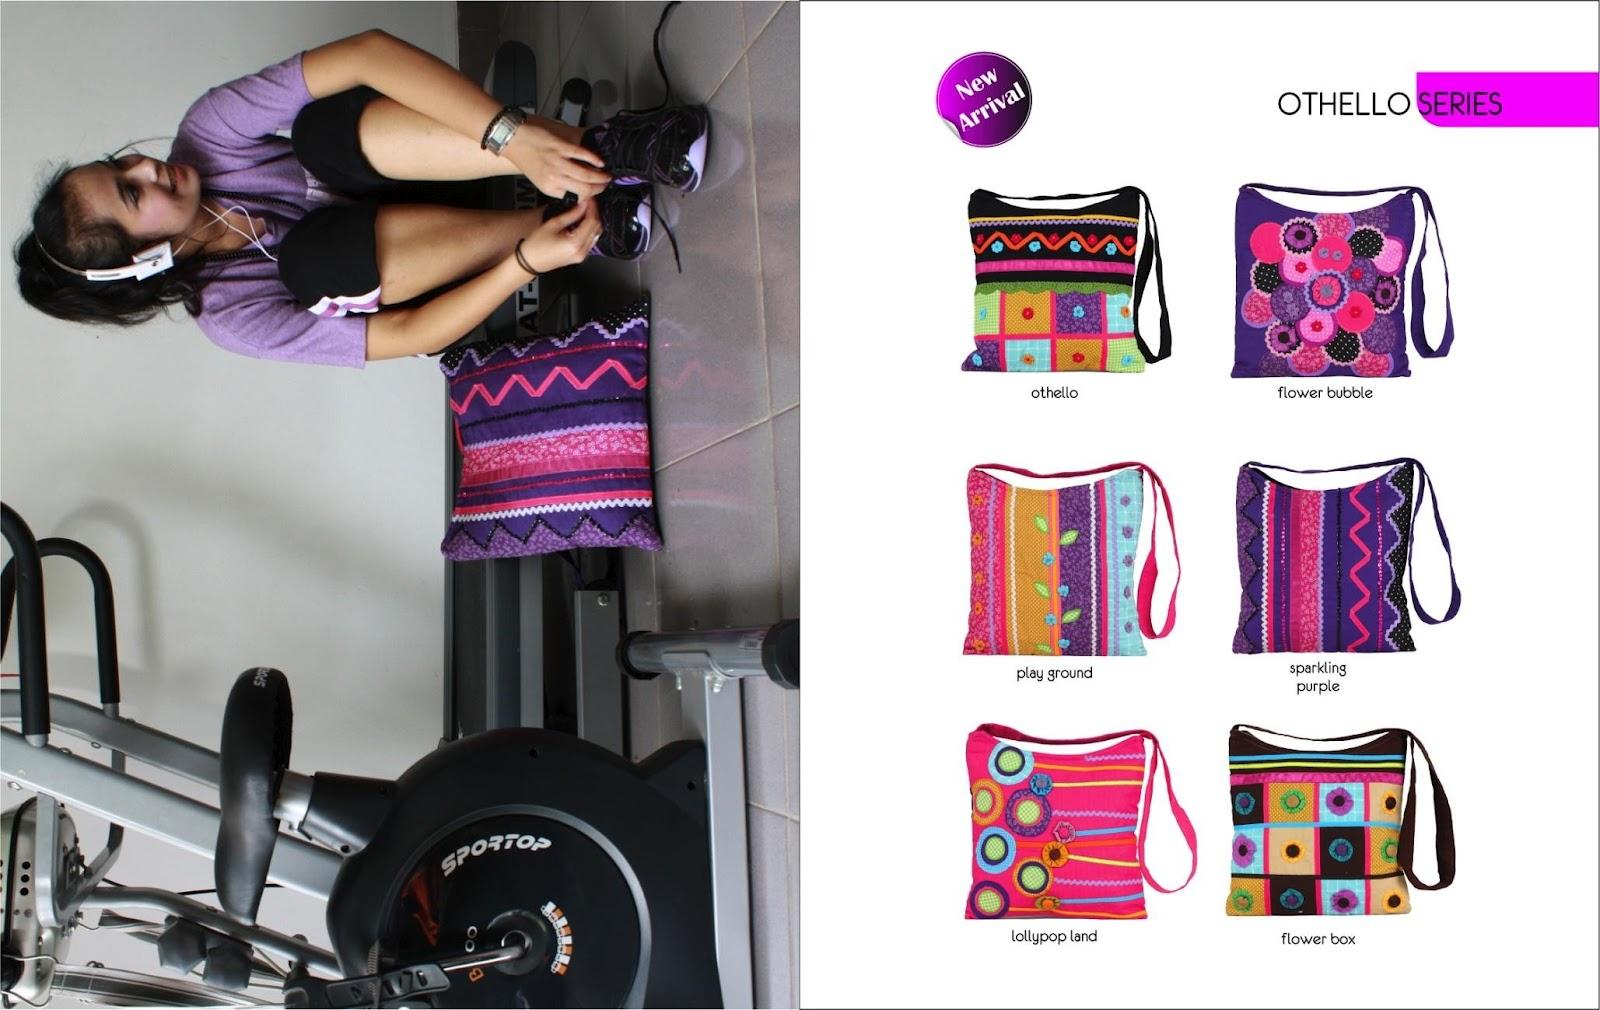 Tas Etnik Cantik Wanita Online Laptop Waist Bag Barca Maika Murah Gaul